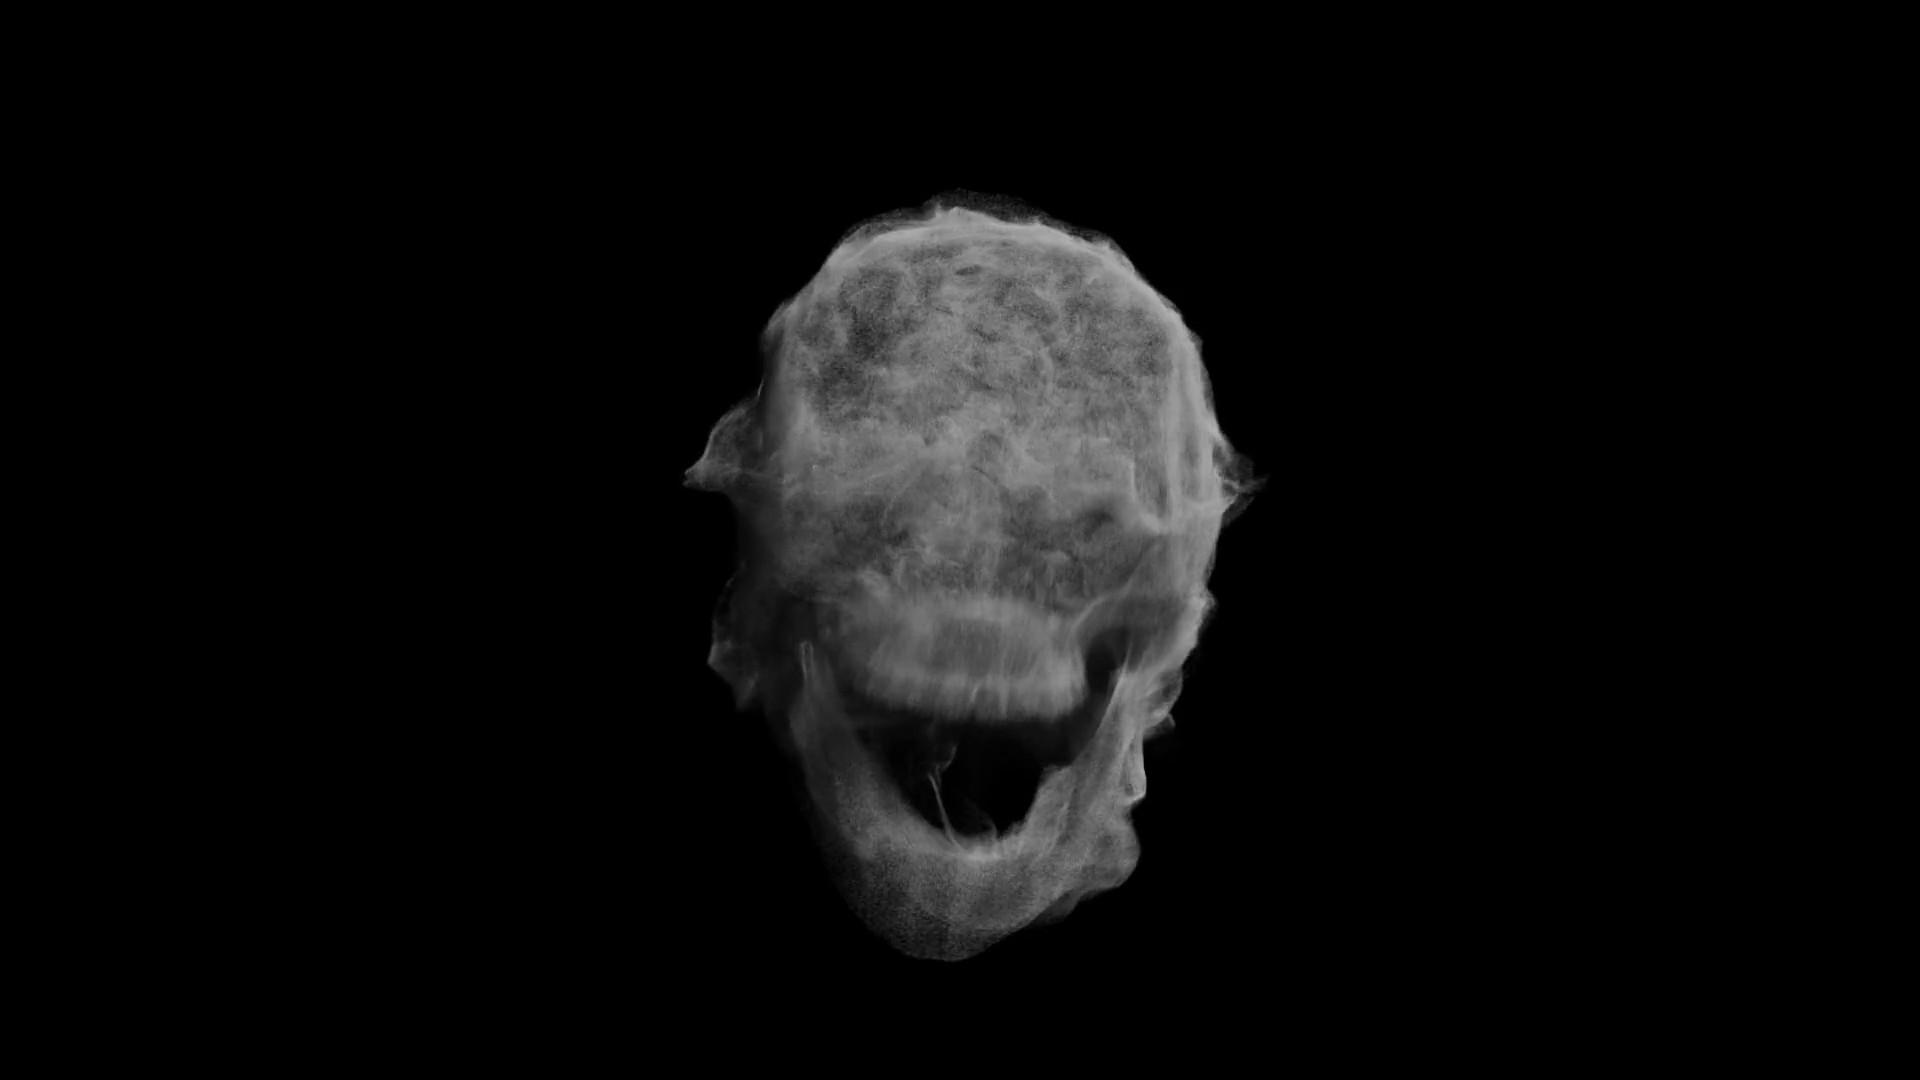 Dangerous Hd Wallpaper Smoke Skull 57 Images